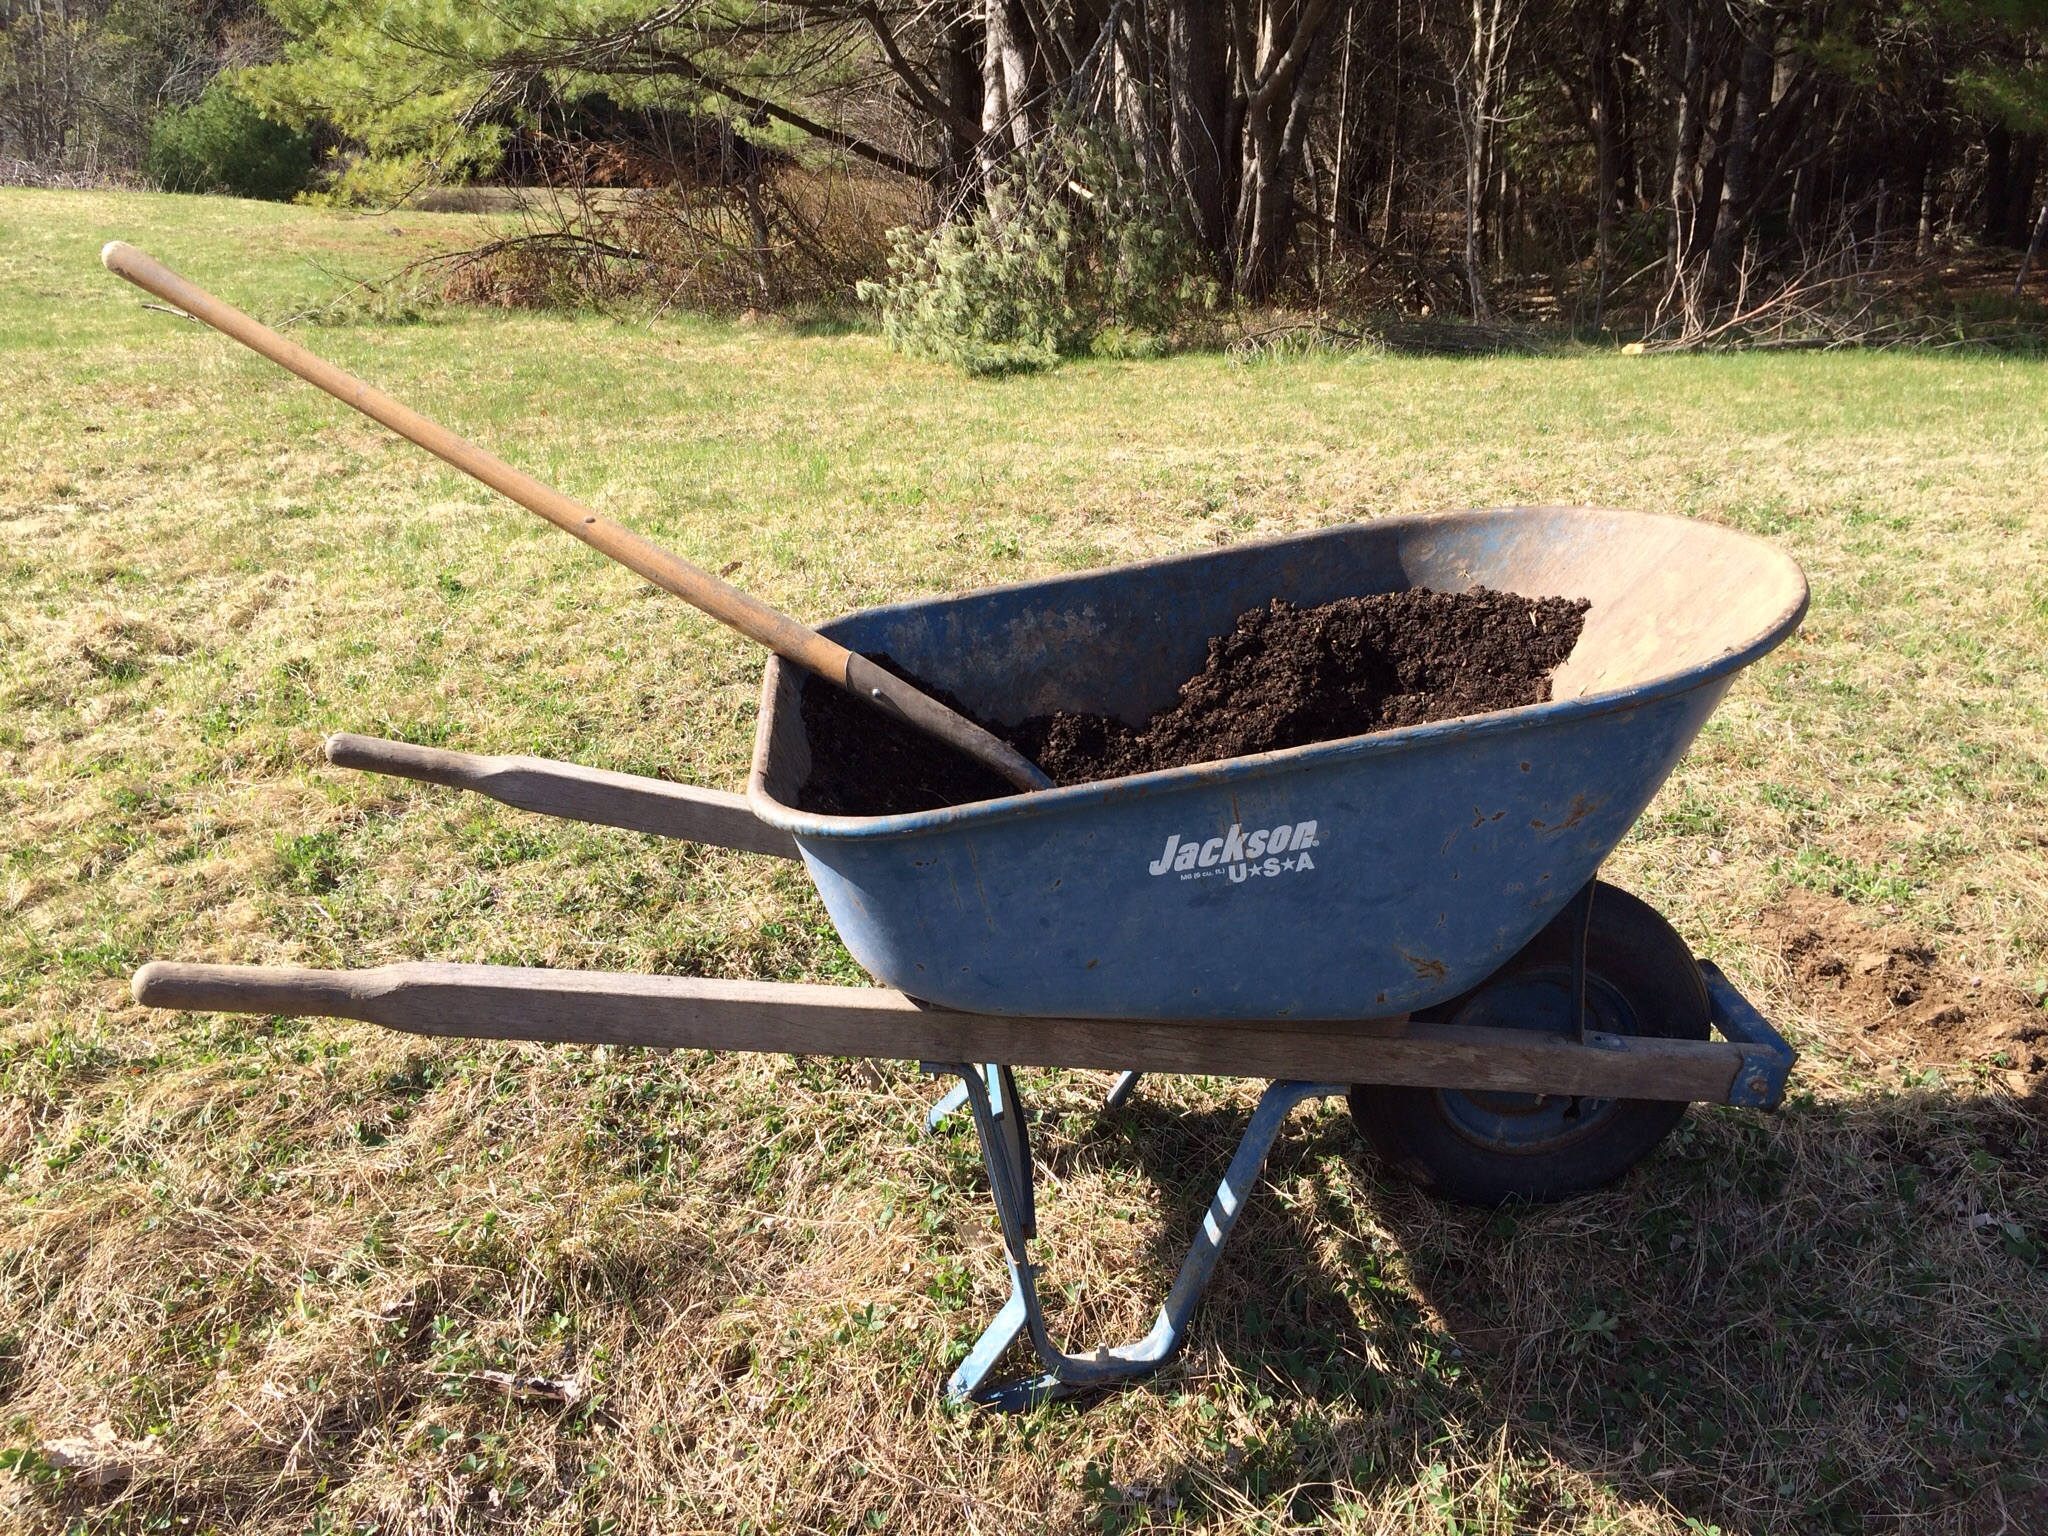 Gratuitous wheelbarrow shot.